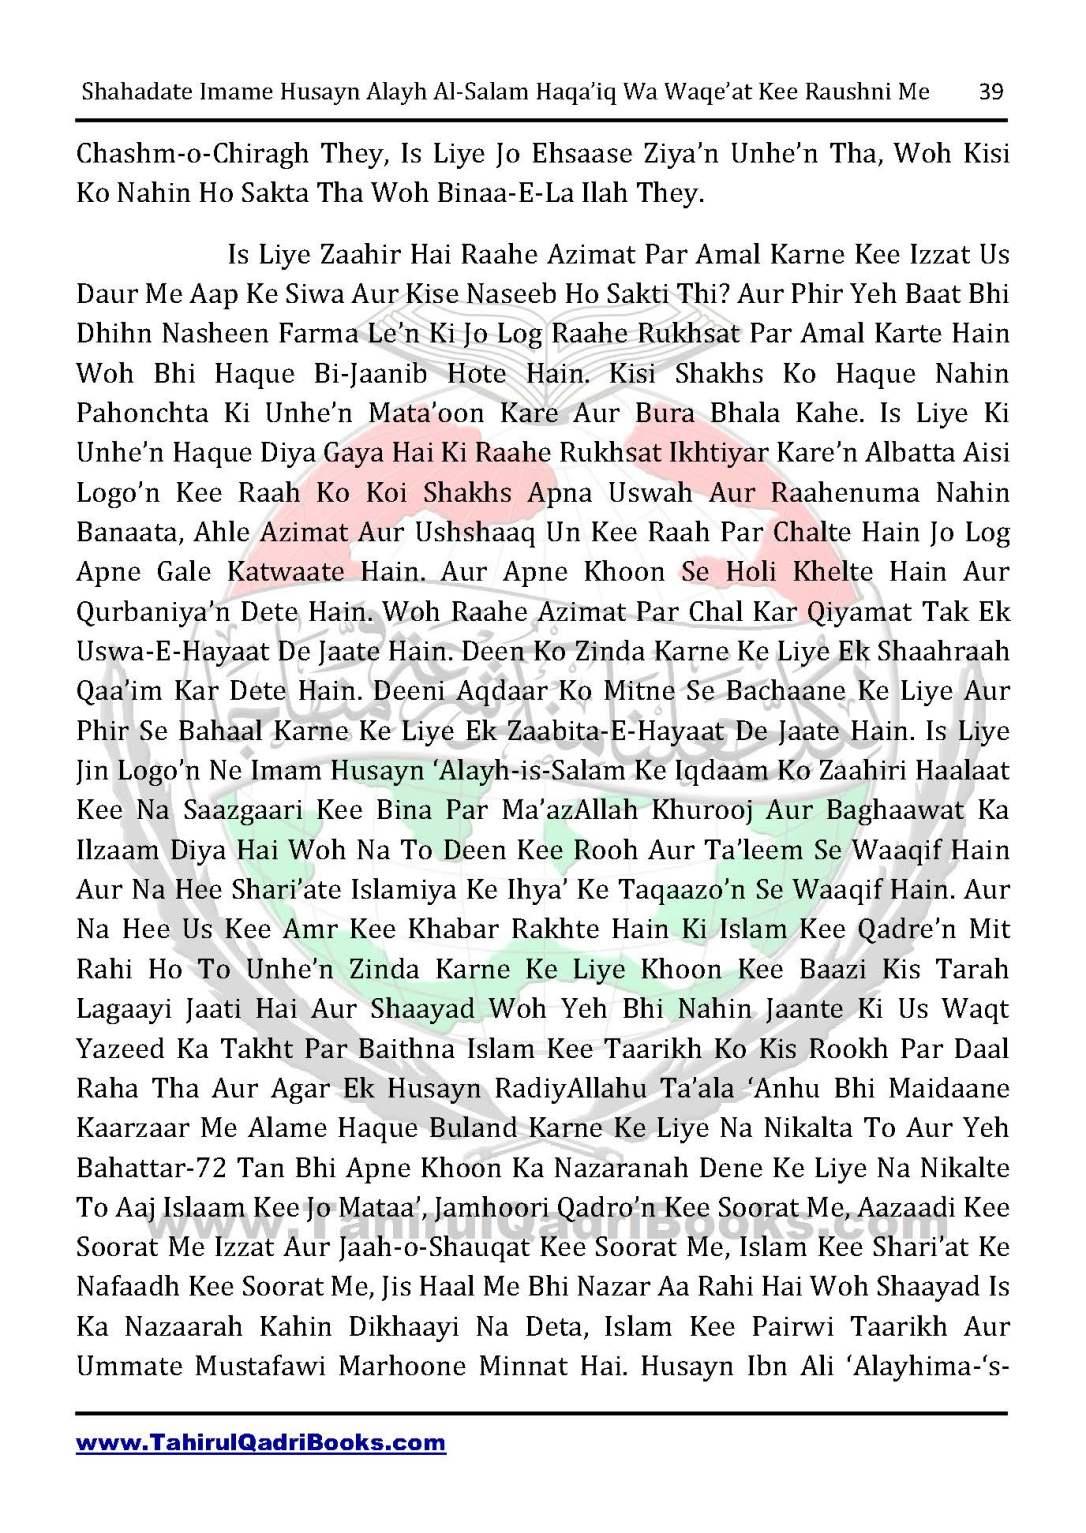 shahadate-imame-husayn-alayh-is-salam-haqaiq-wa-waqe_at-kee-raushni-me-in-roman-urdu-unlocked_Page_39